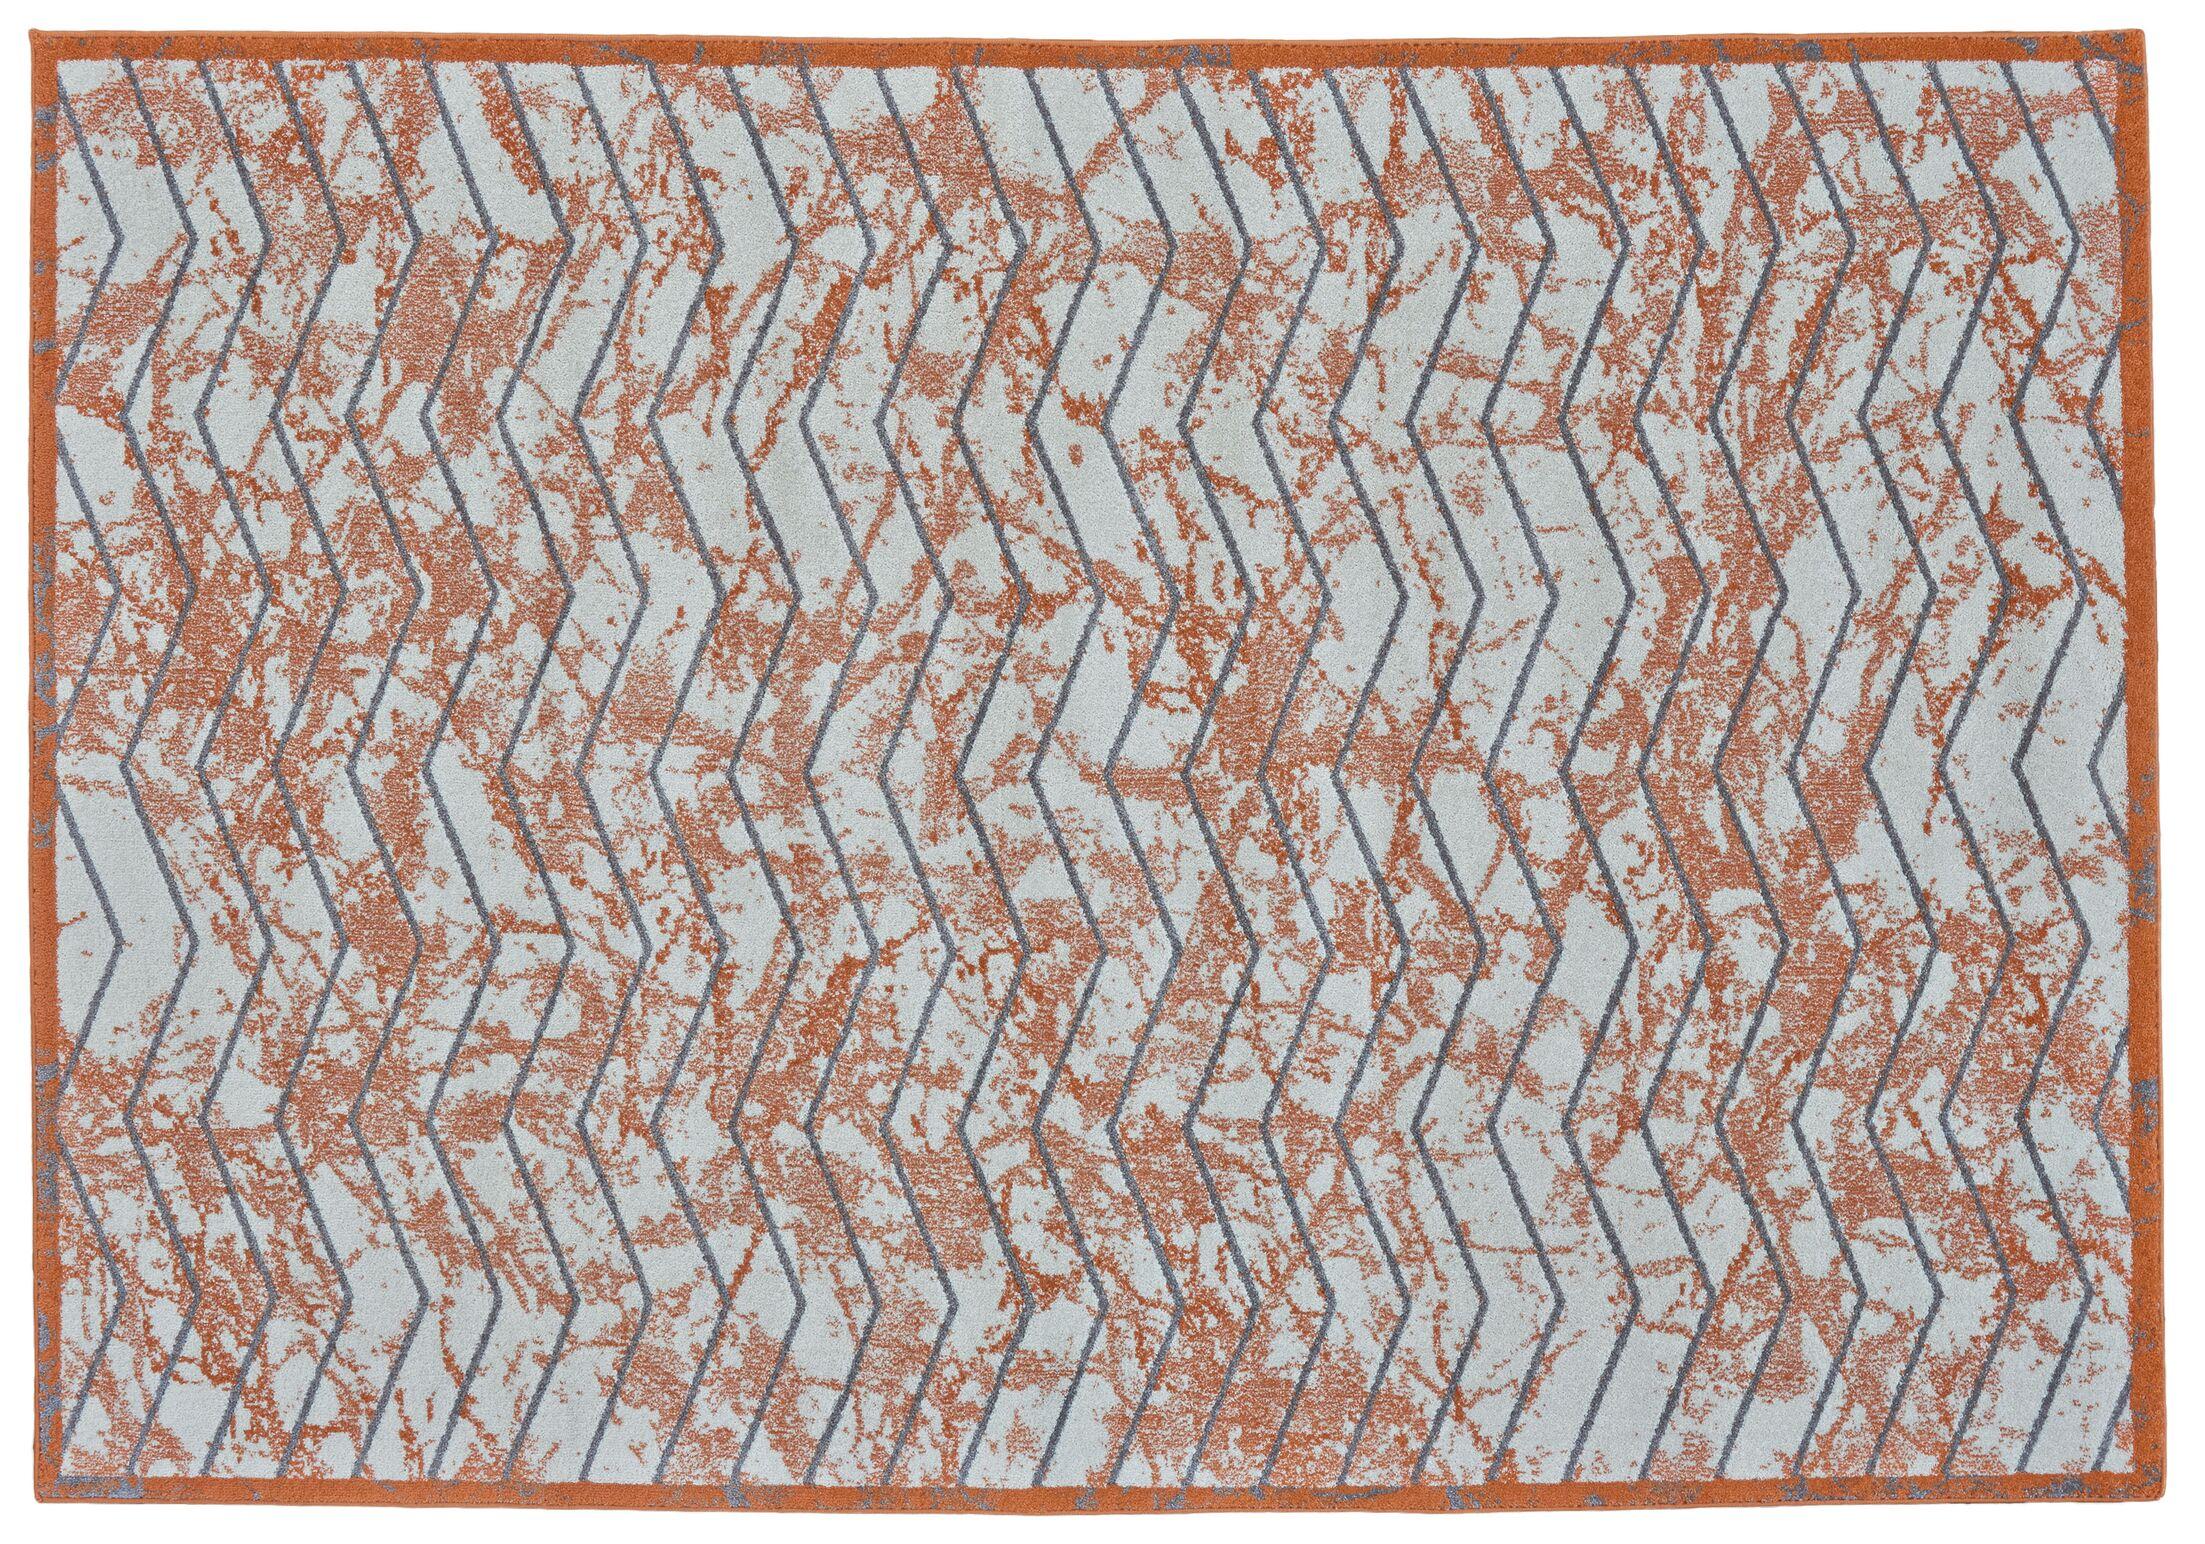 Haire Nectarine Area Rug Rug Size: Rectangle 10' x 13'2